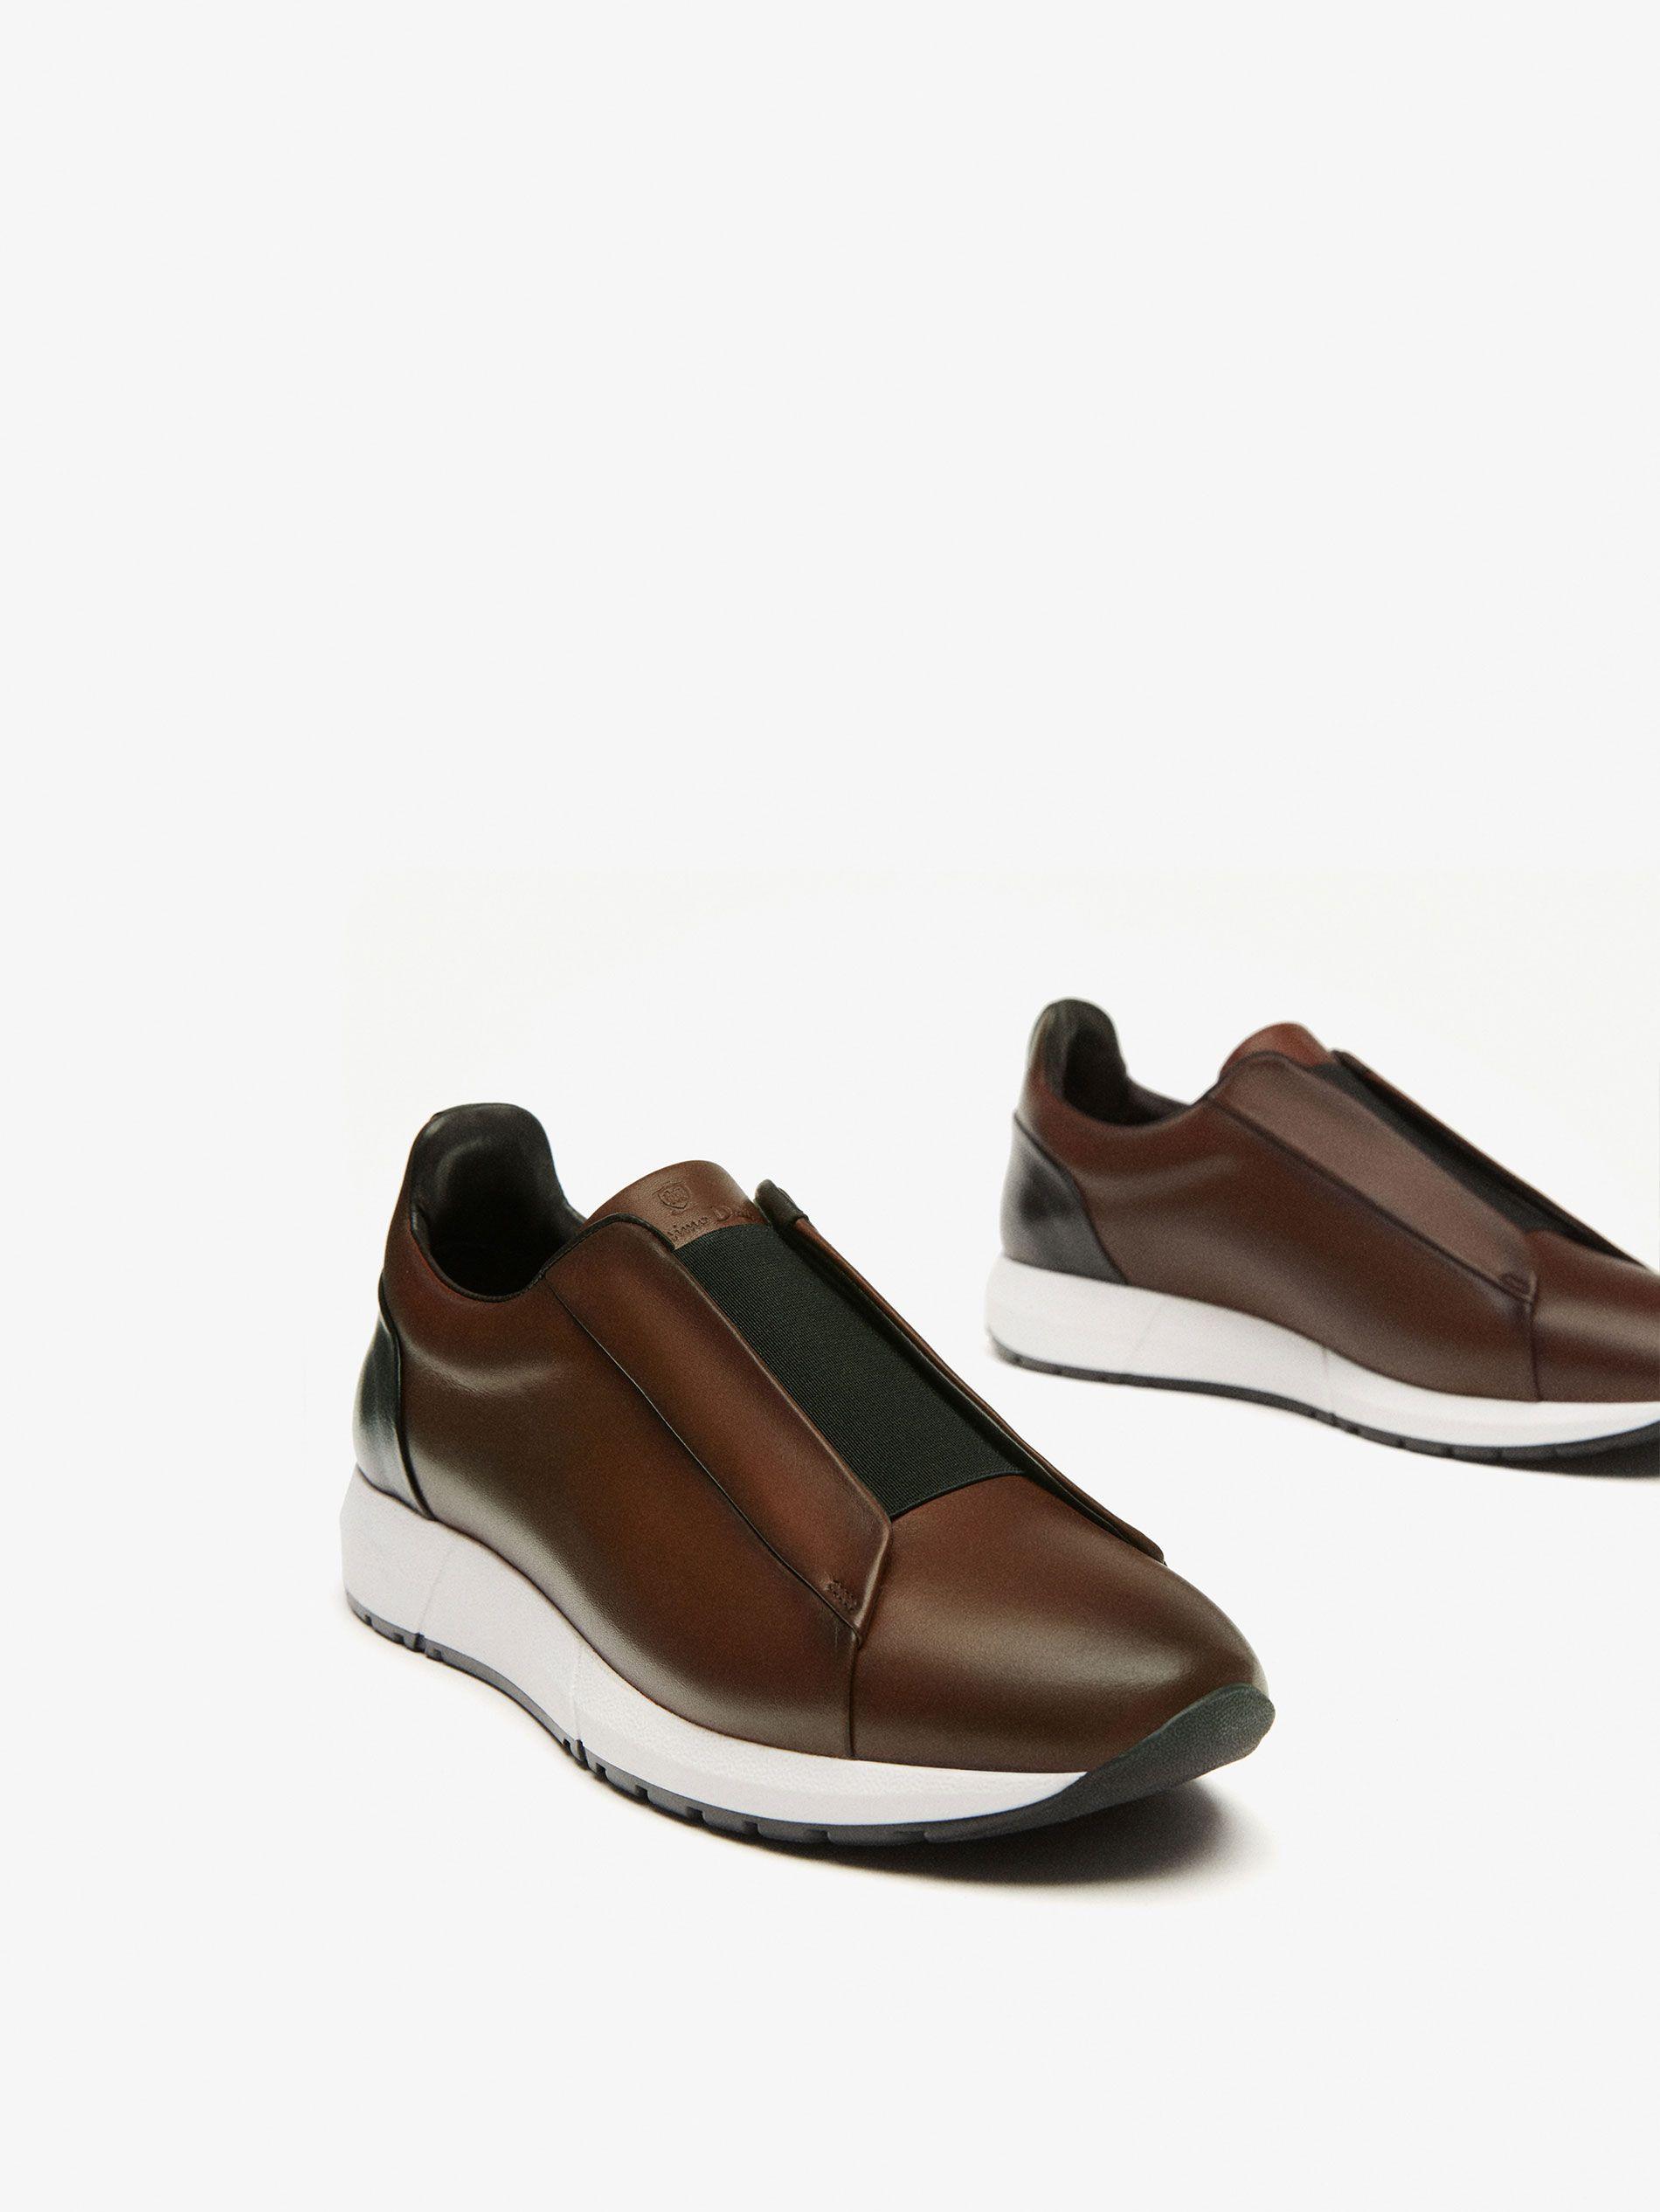 MOCASIN PIEL AZUL de HOMBRE HOMBRE HOMBRE Zapatos Ver todo de Massimo 0a929a